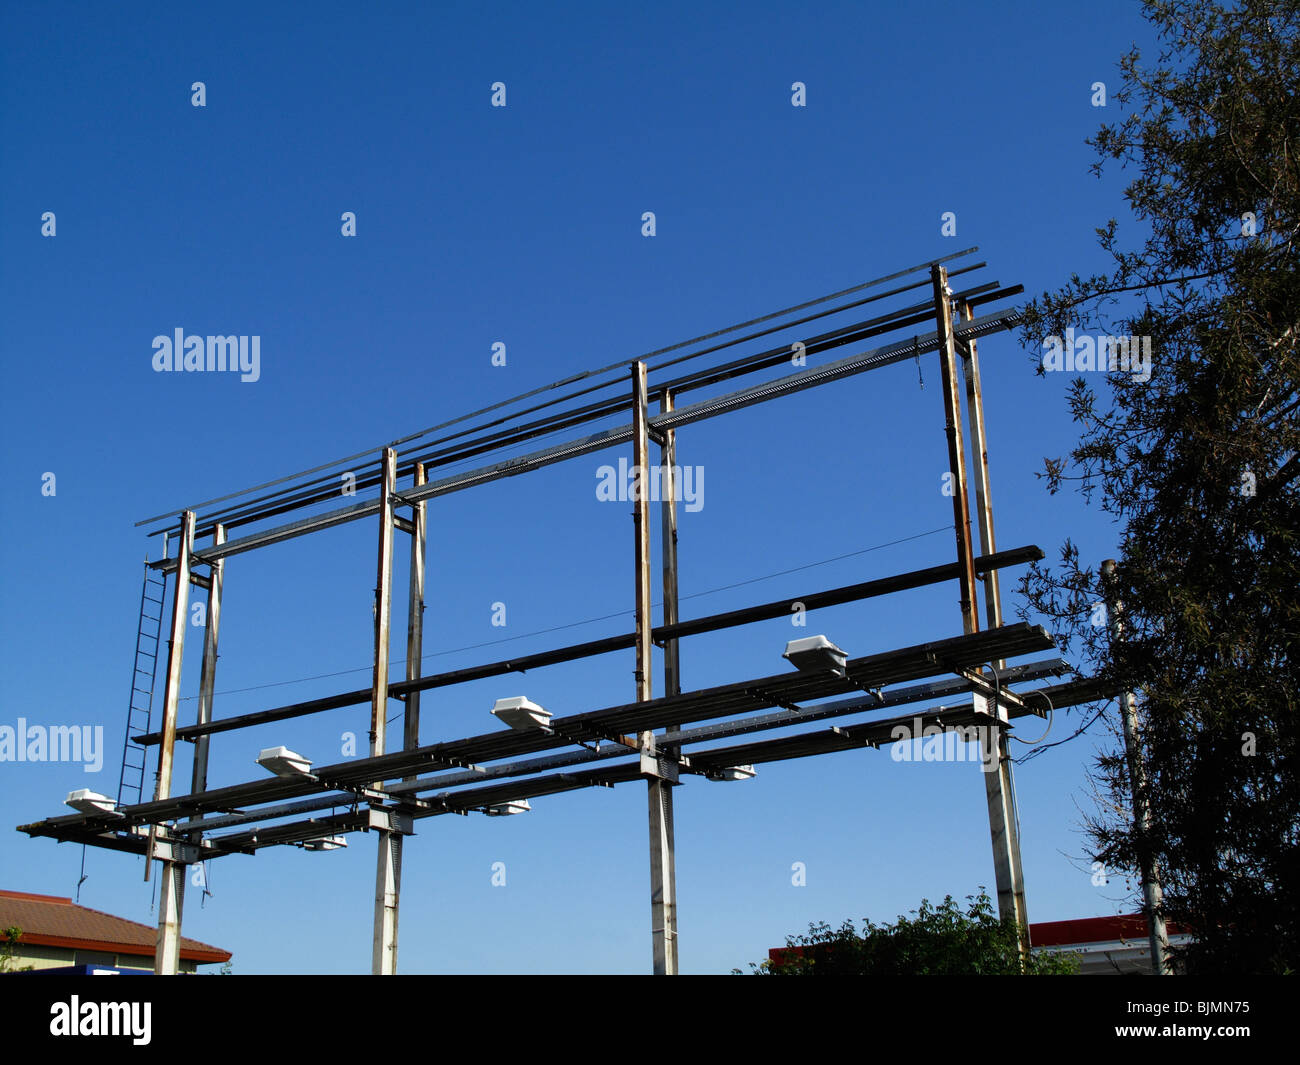 Billboard Frame Stockfotos & Billboard Frame Bilder - Alamy